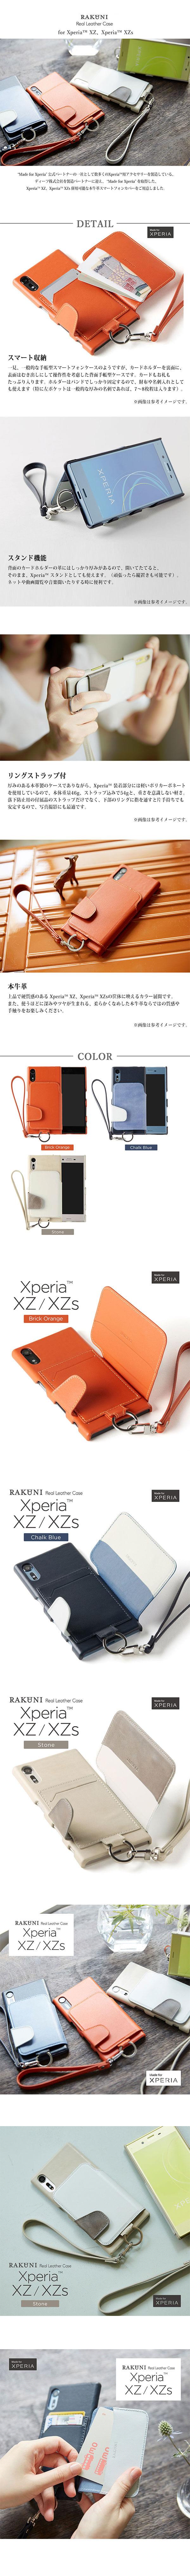 d3d8748c76 Xperia XZs XZ 本革 牛革ケース 背面ポケット スマホケース ストラップ付 カード収納 大容量 名刺入れ SO-03J / SOV35 / Xperia  XZ /【Buyee】